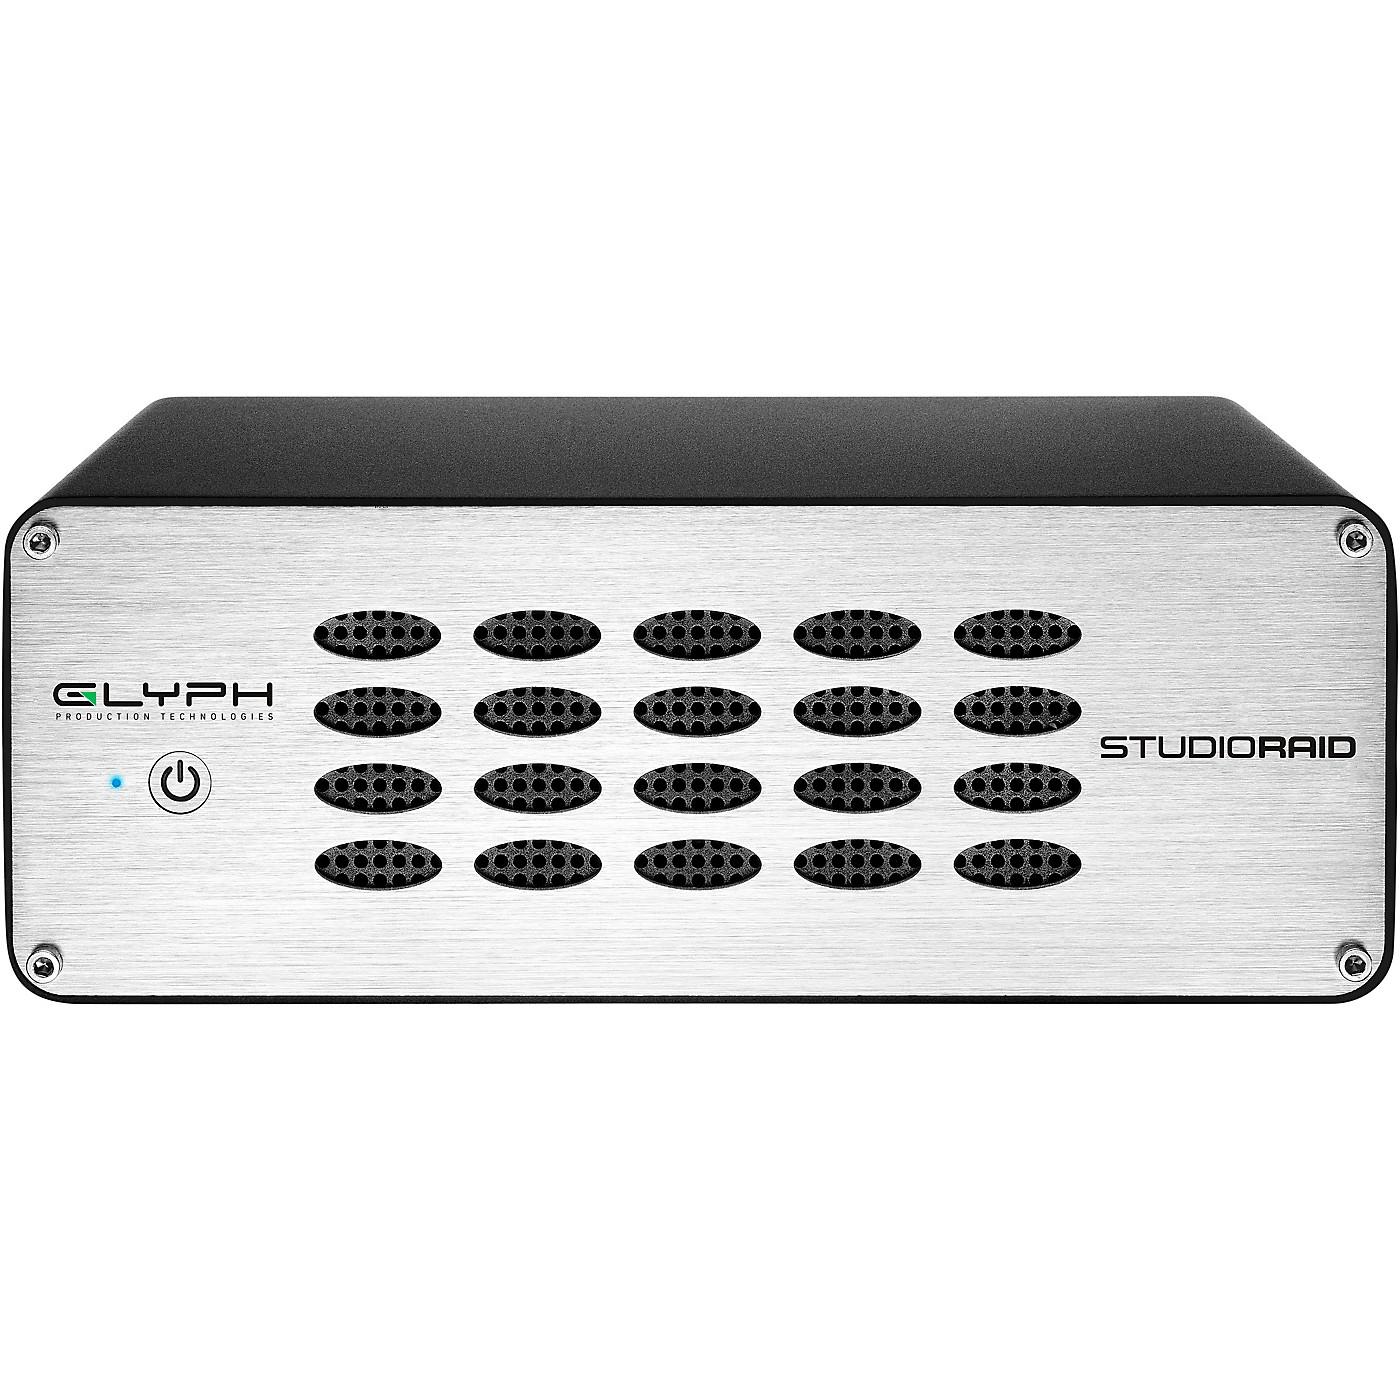 Glyph StudioRAID 2-Bay USB 3.0 RAID Array thumbnail